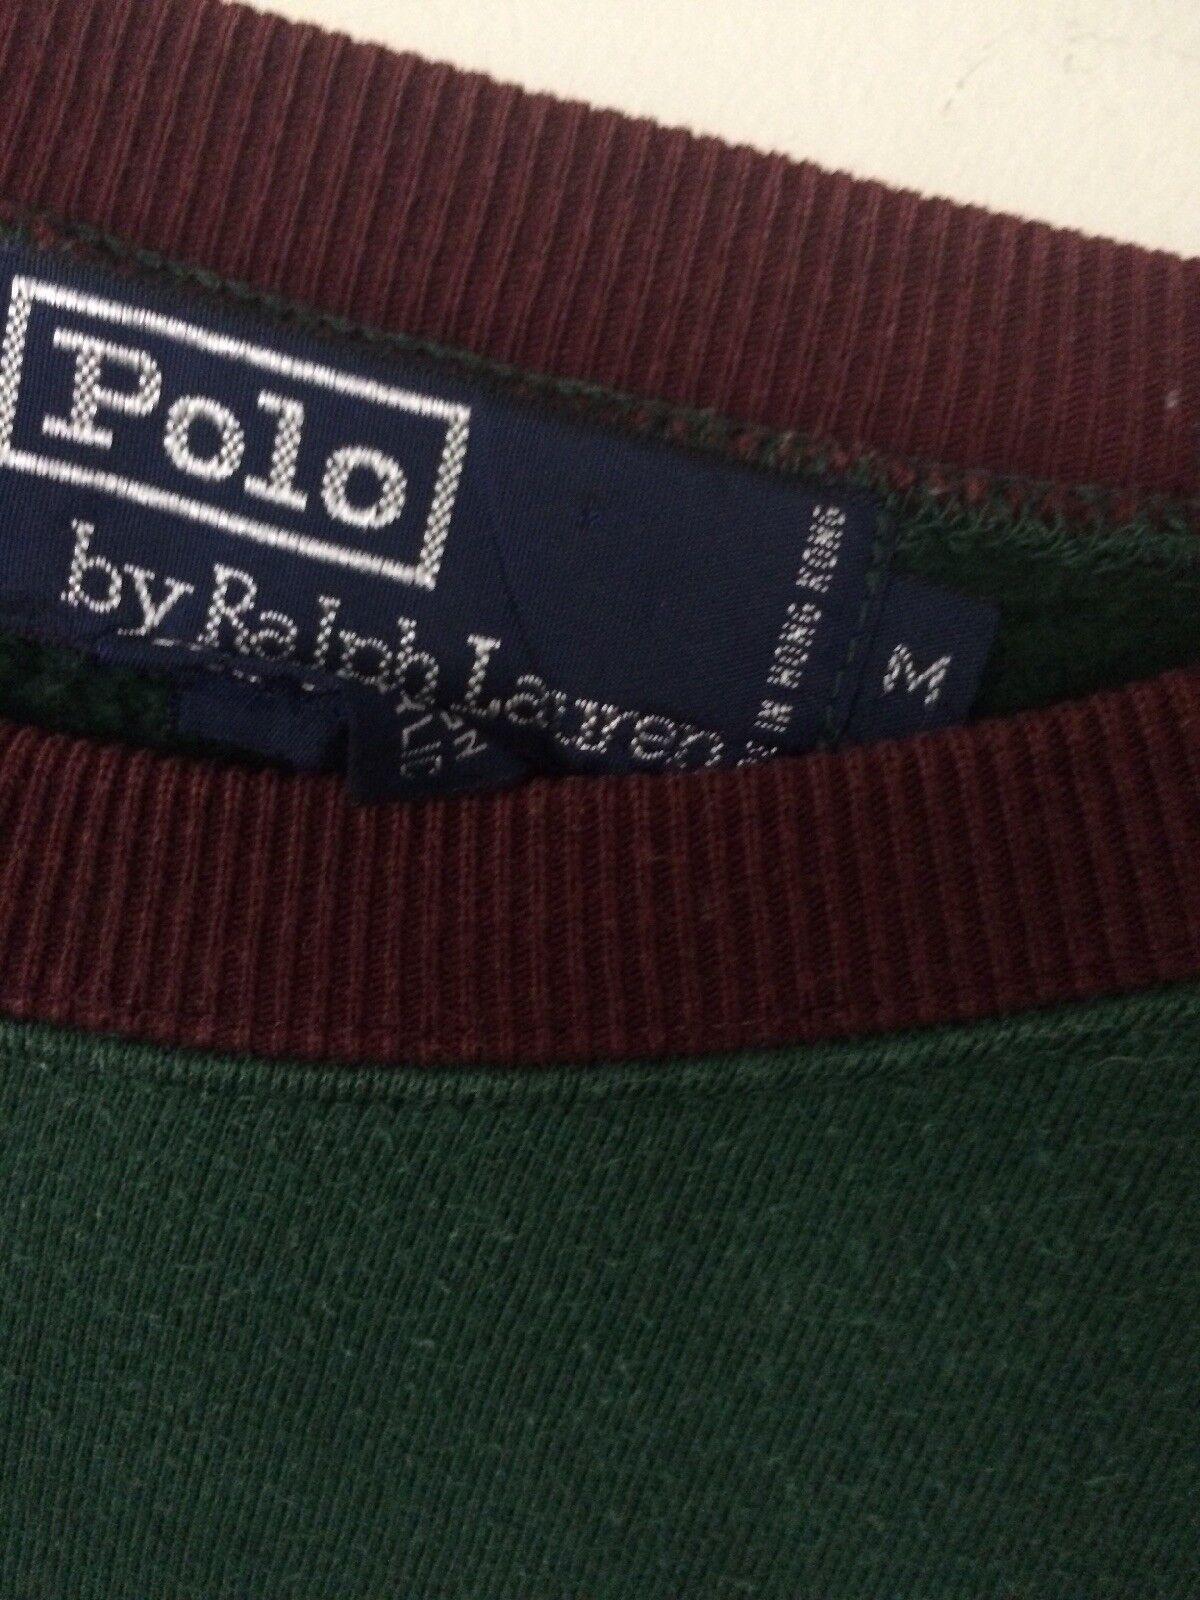 Vtg 80s 90s Polo Ralph Lauren RLPC Green Sweatshi… - image 2